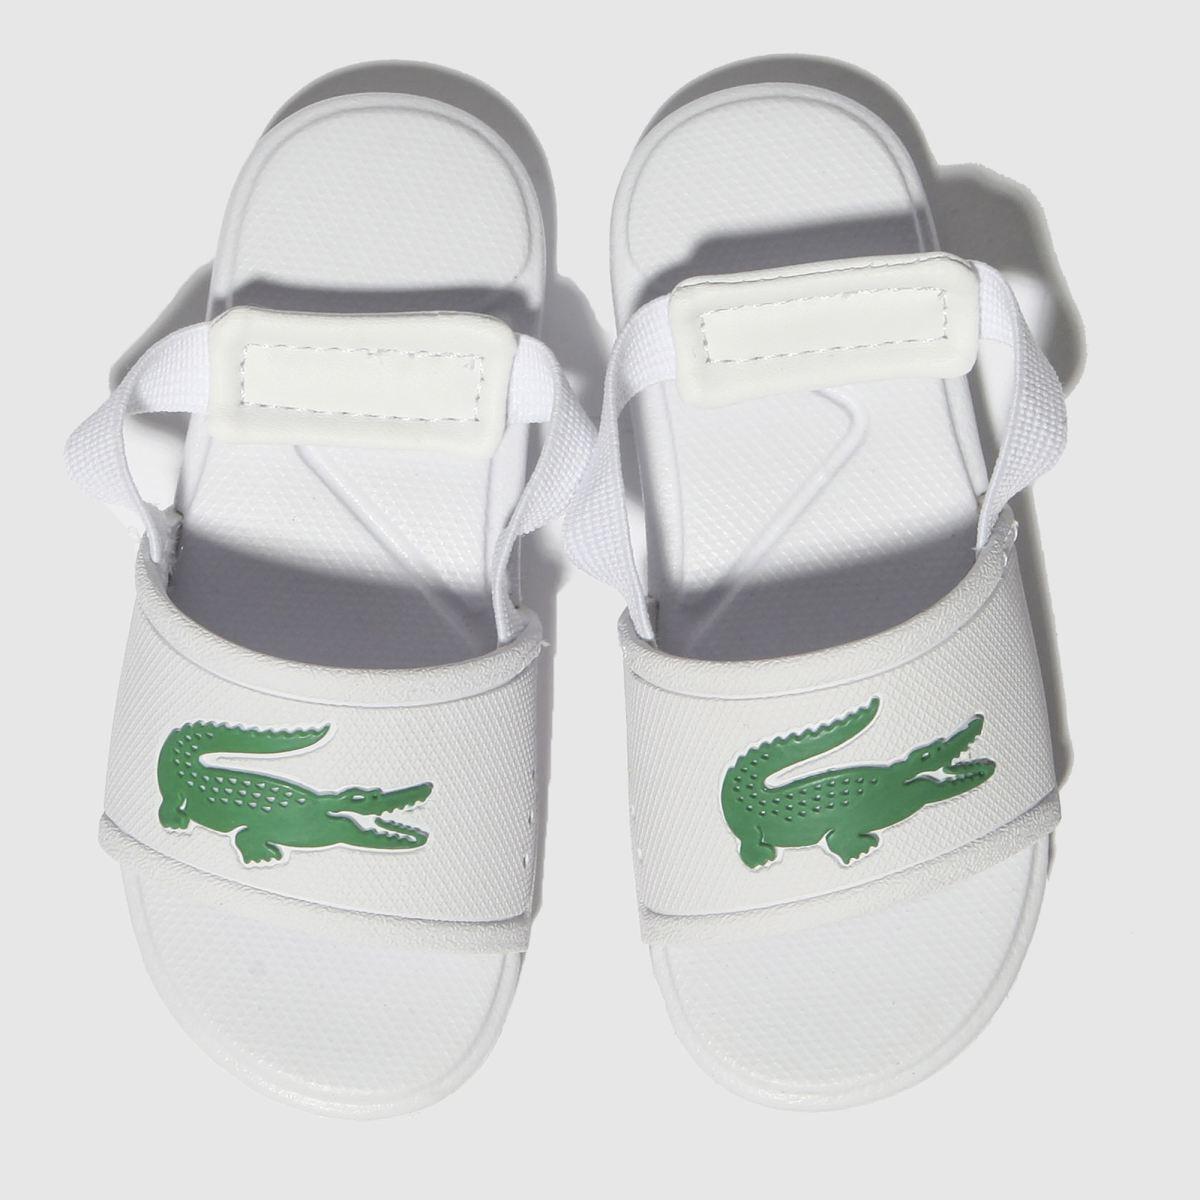 Lacoste White & Green L.30 Slide Sandals Toddler